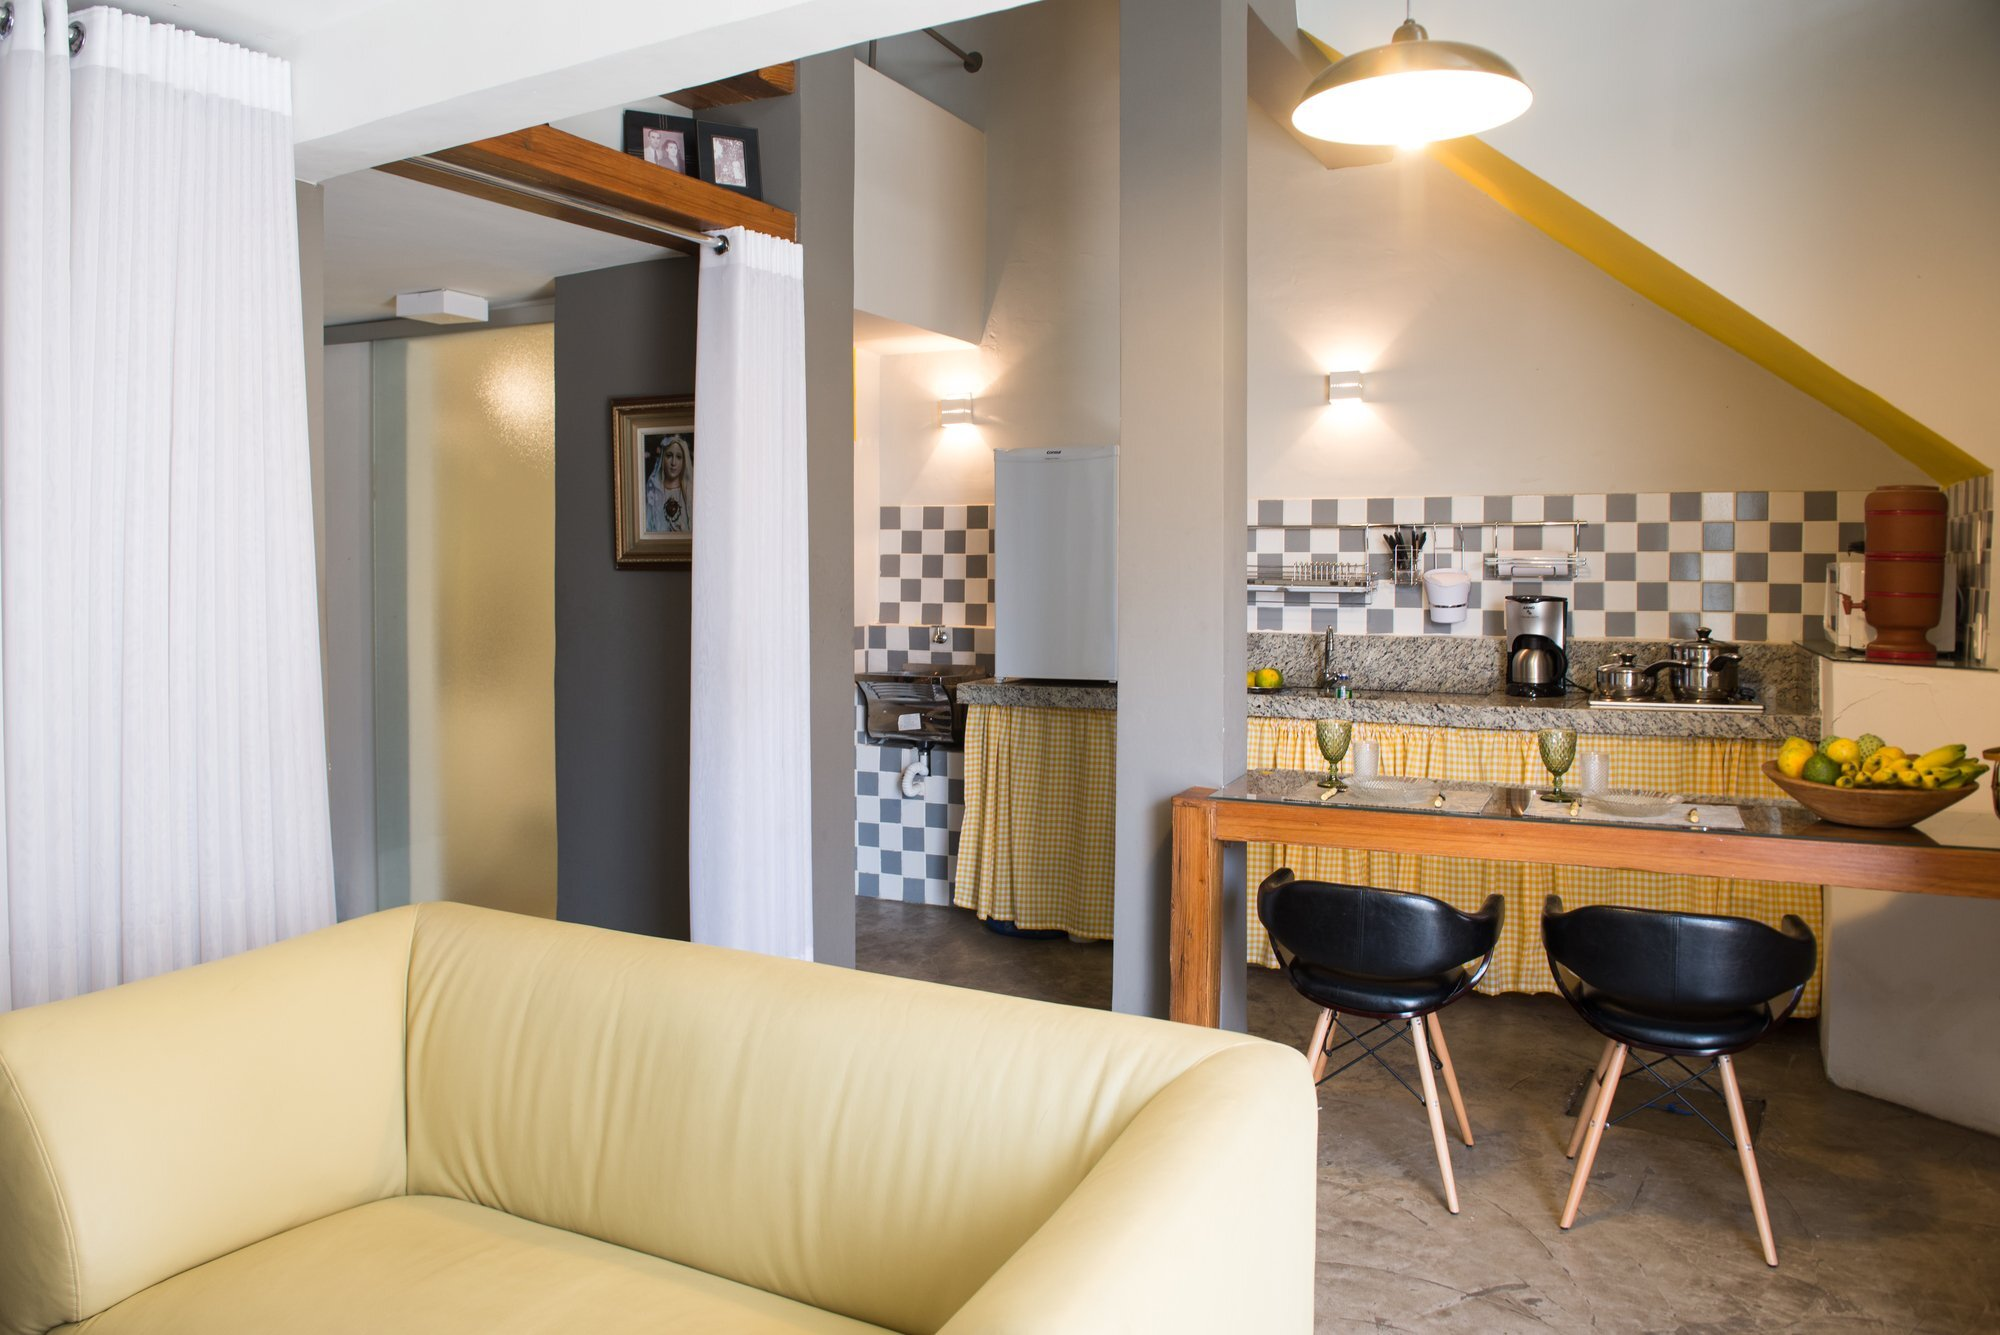 Loft Grandpa - MEIUS Arquitetura -  Brazil - Breakfast Bar - Humble Homes